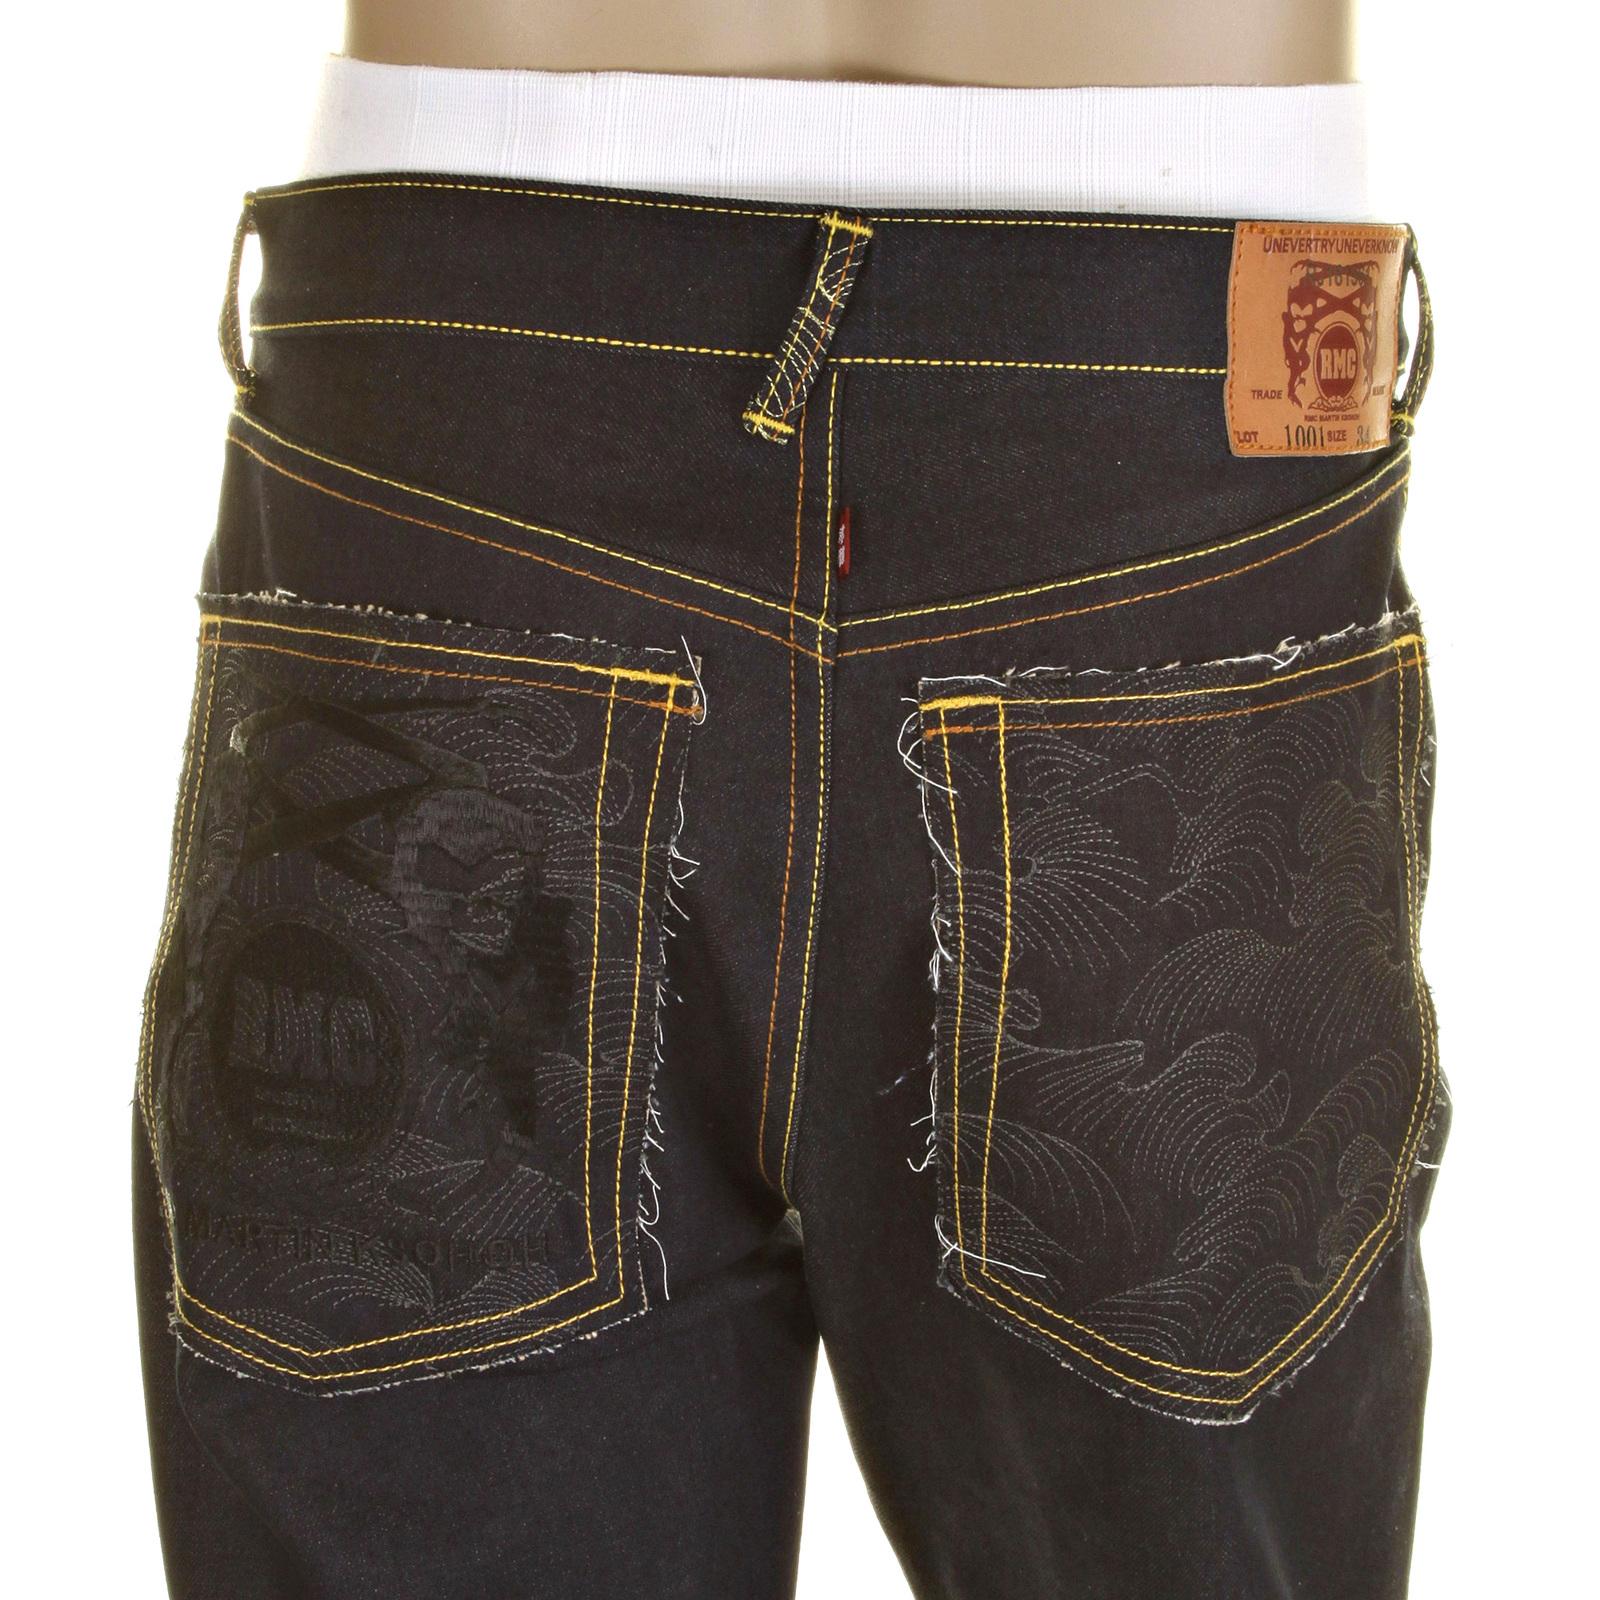 Dark Indigo Raw Selvedge Denim Jeans from Red Monkey